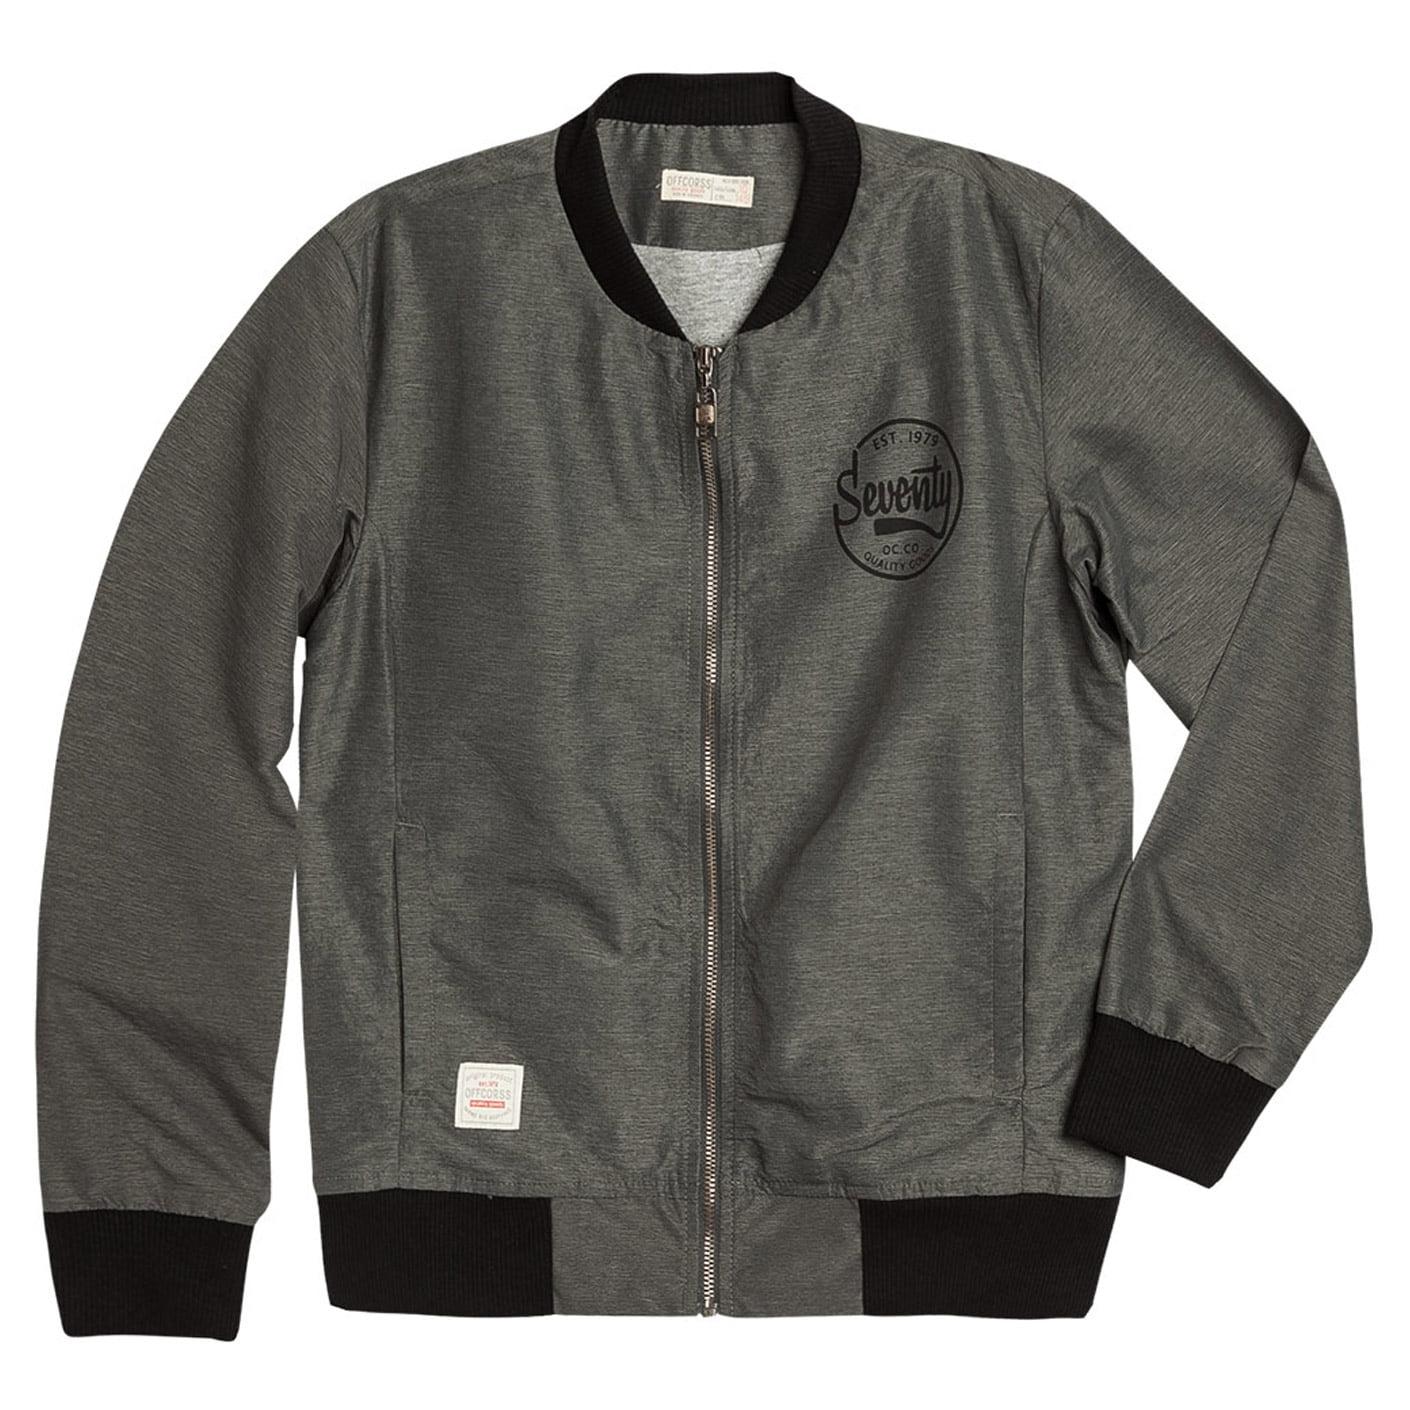 OFFCORSS LONG SLEEVE Jacket FOR BOYS